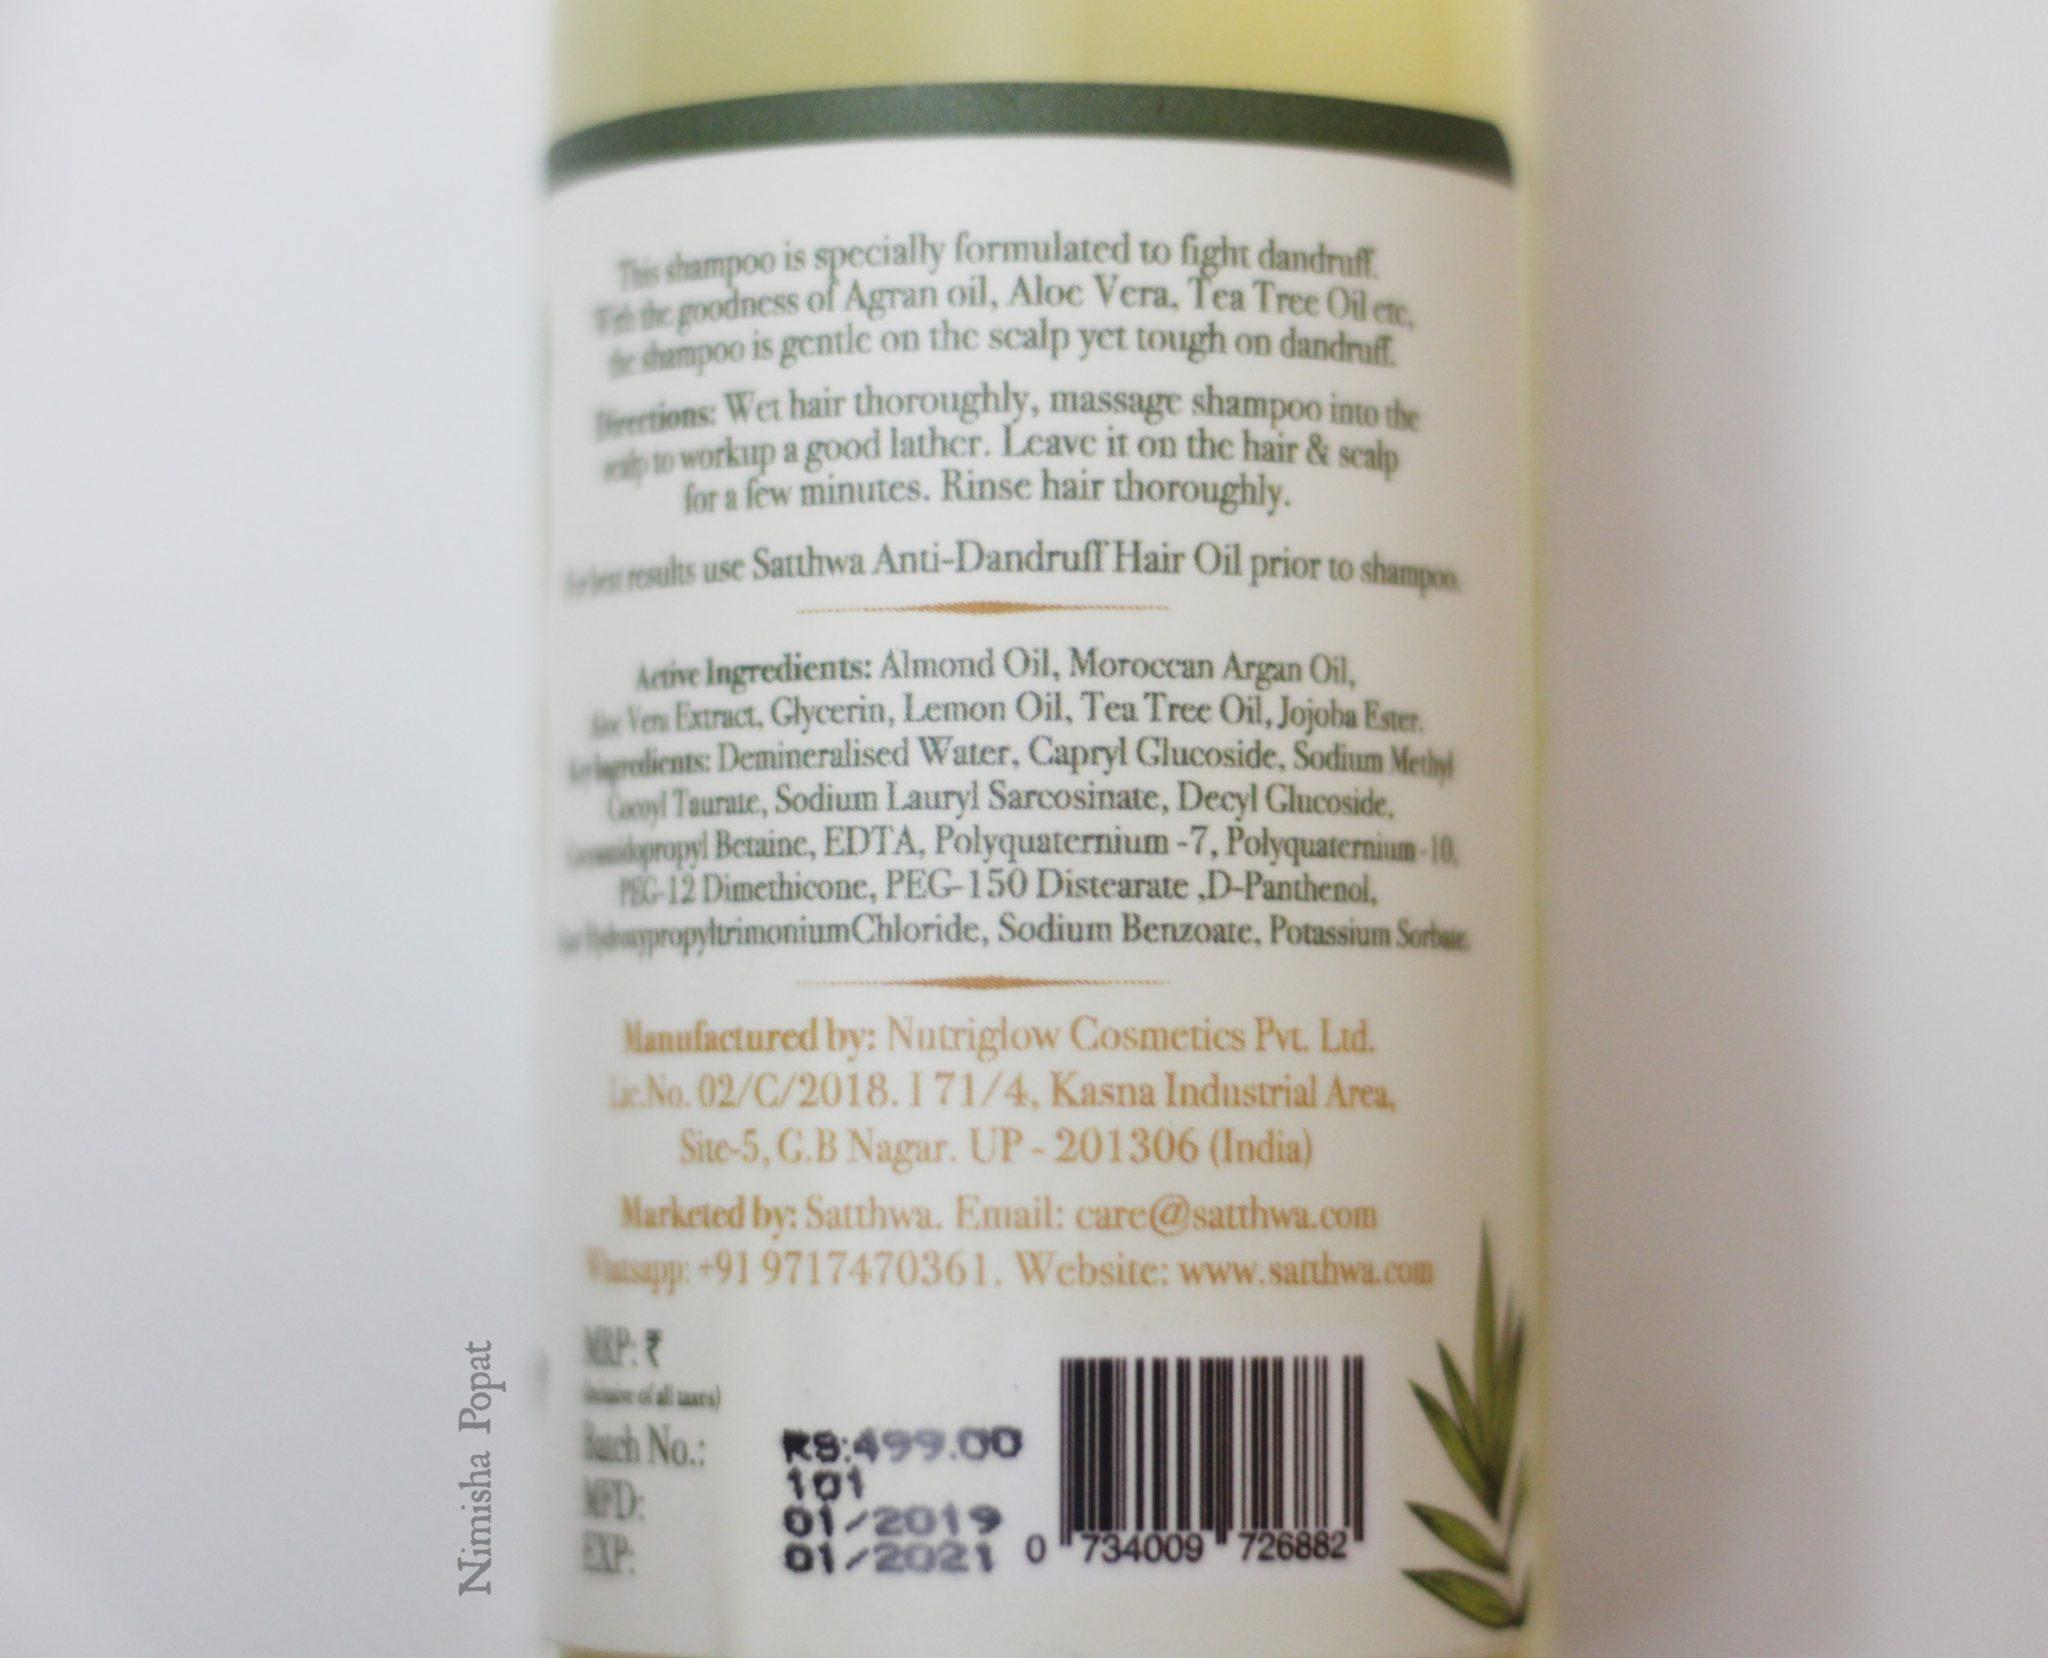 satthwa anti dandruff shampoo review